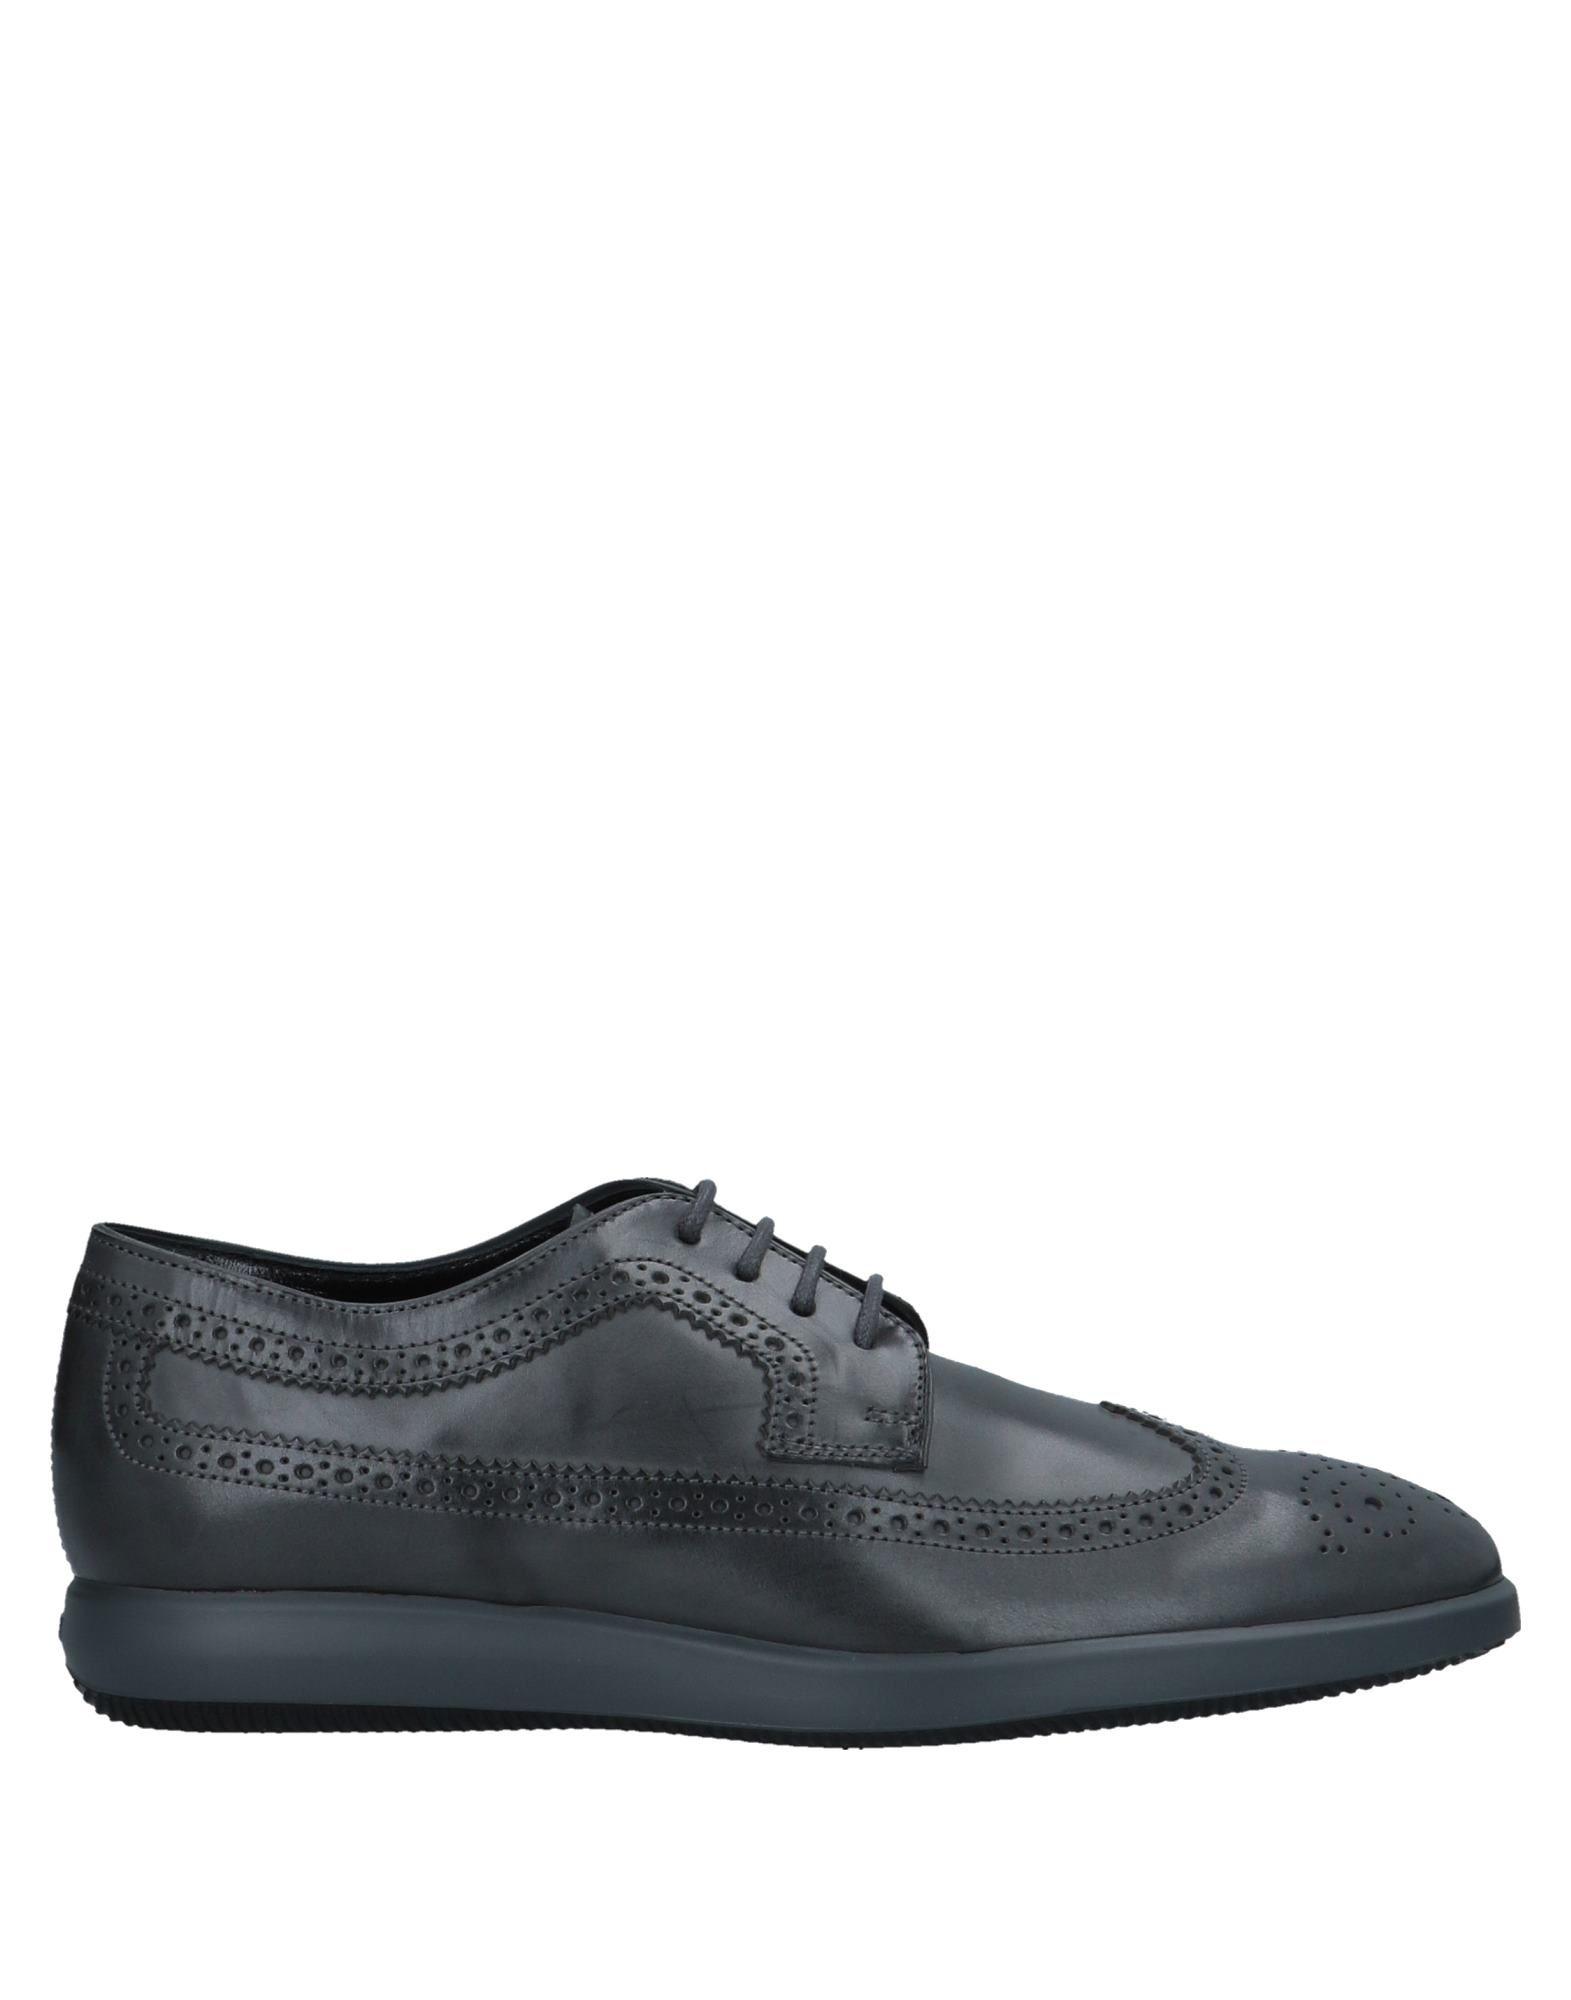 Hogan Schnürschuhe Herren  11543403EC Gute Qualität beliebte Schuhe